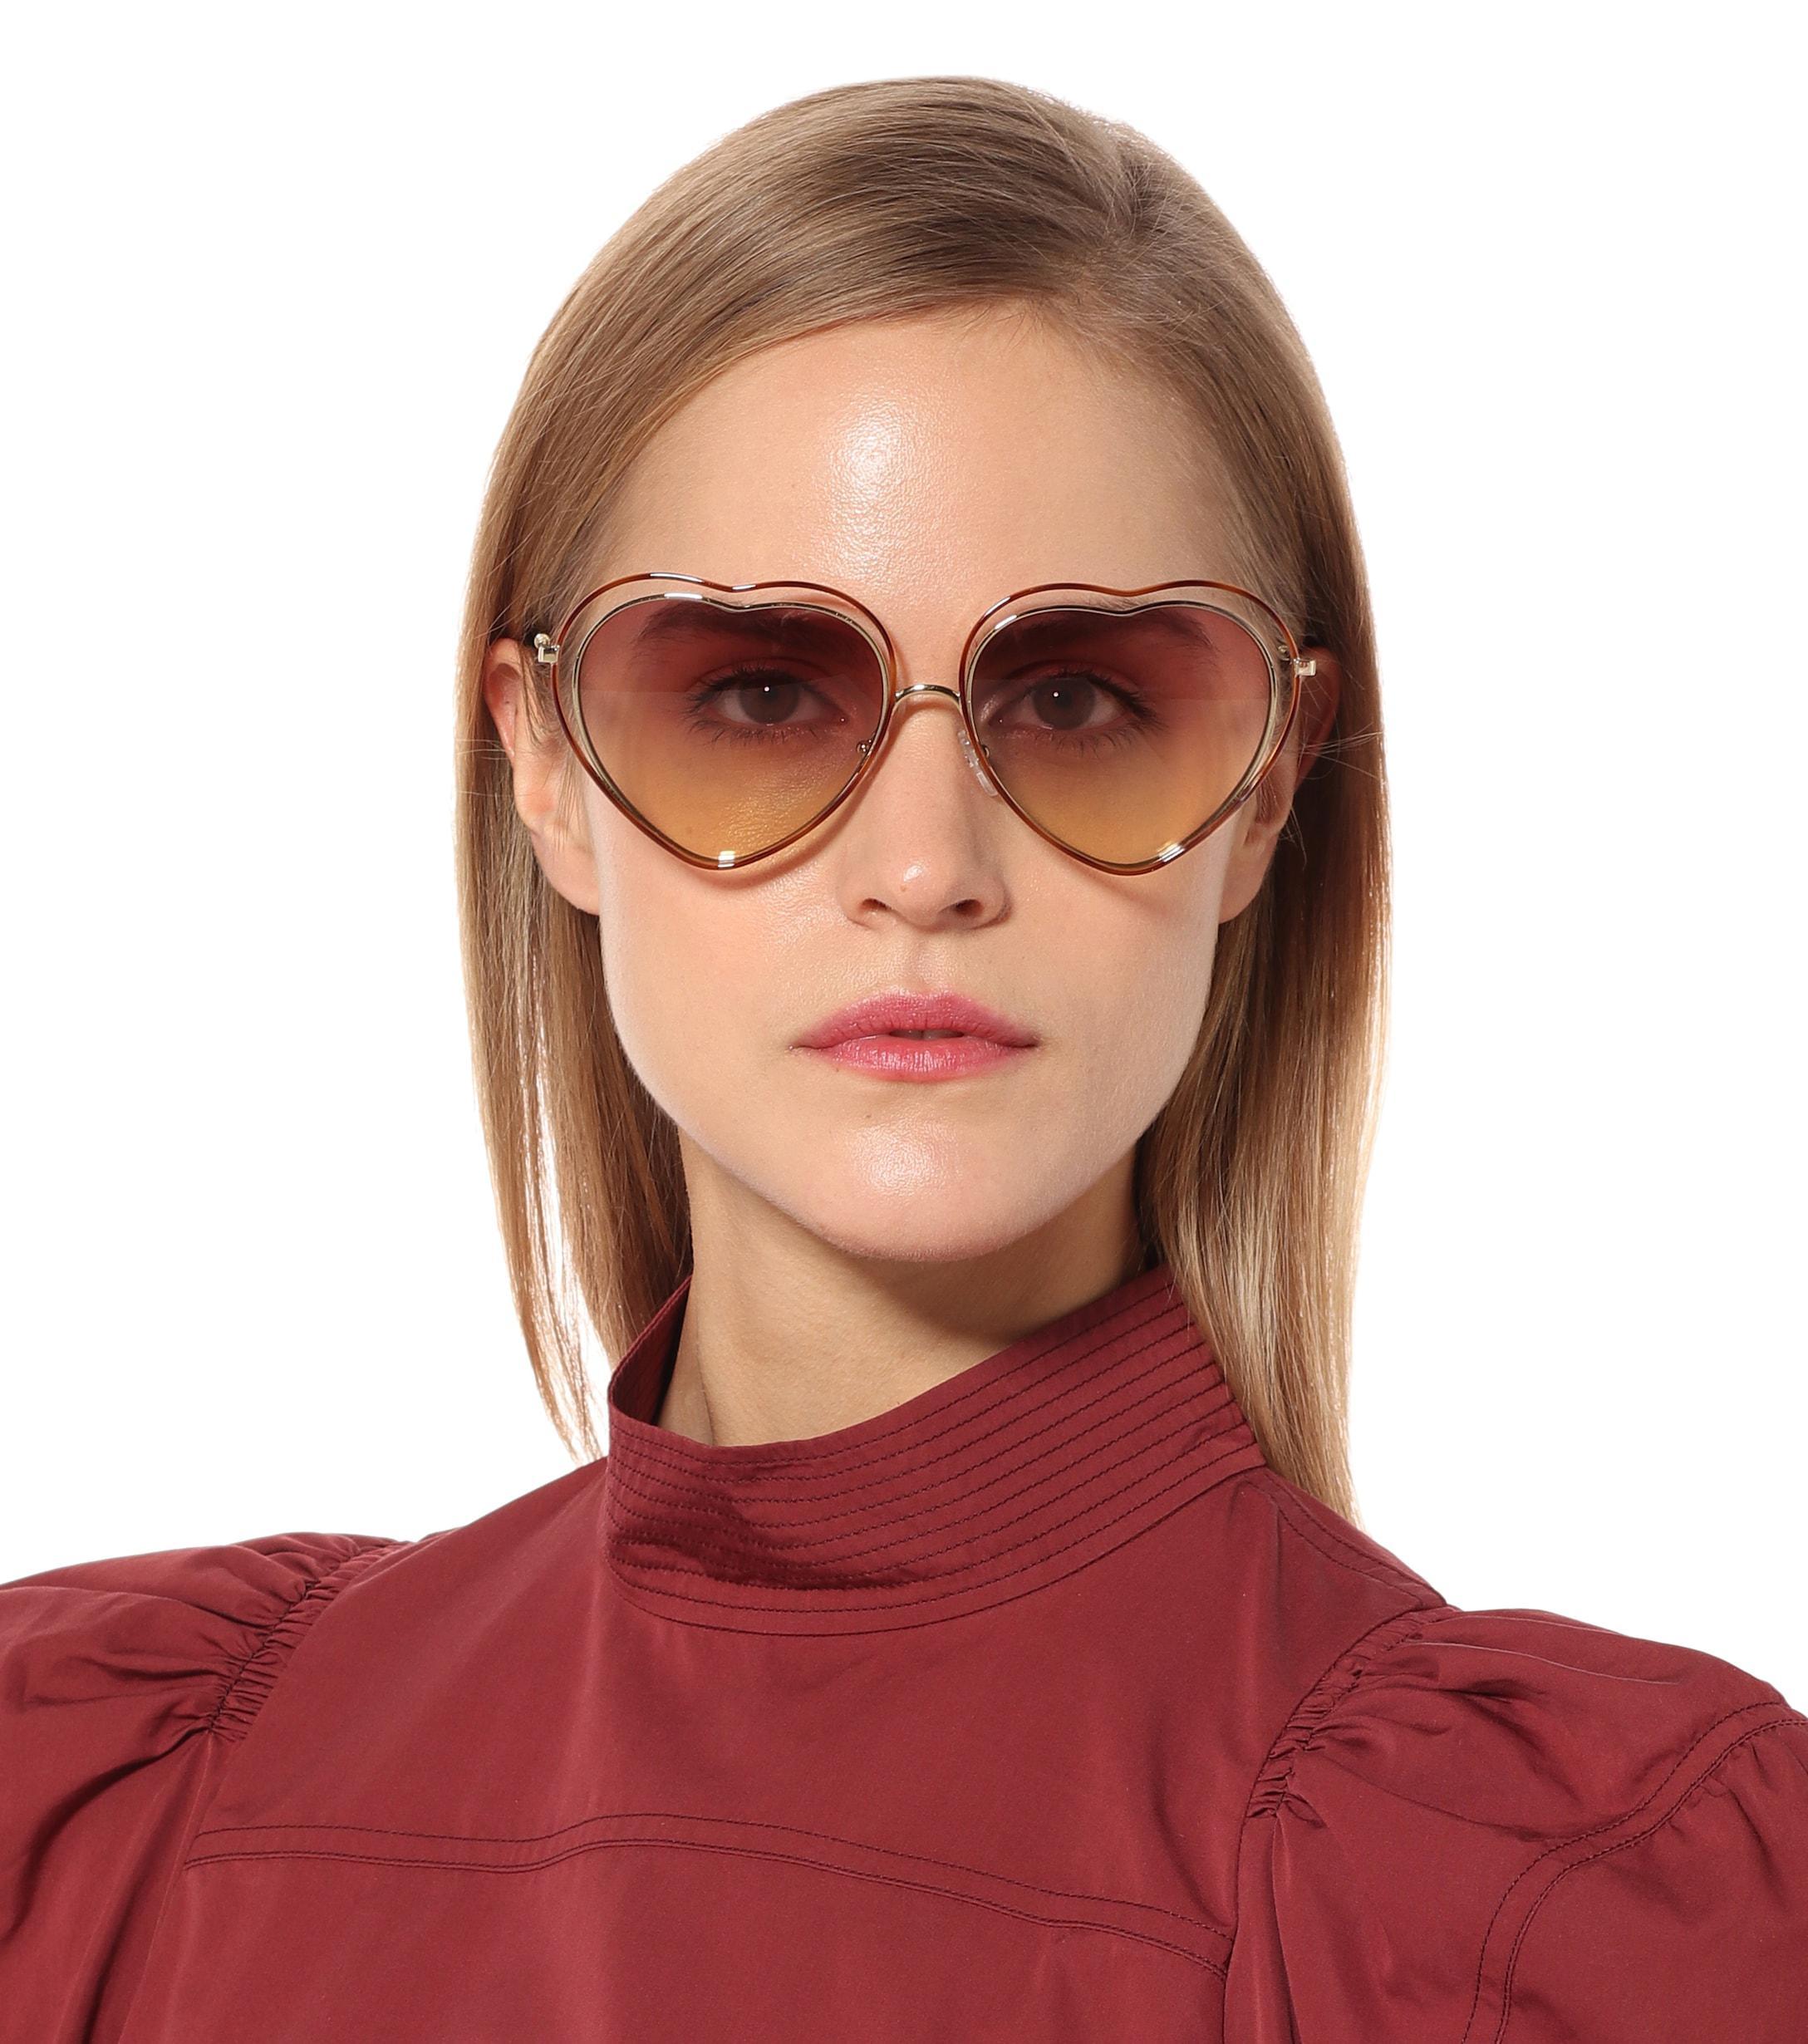 10621a62e7 ... Poppy Heart-shaped Sunglasses - Lyst. View fullscreen